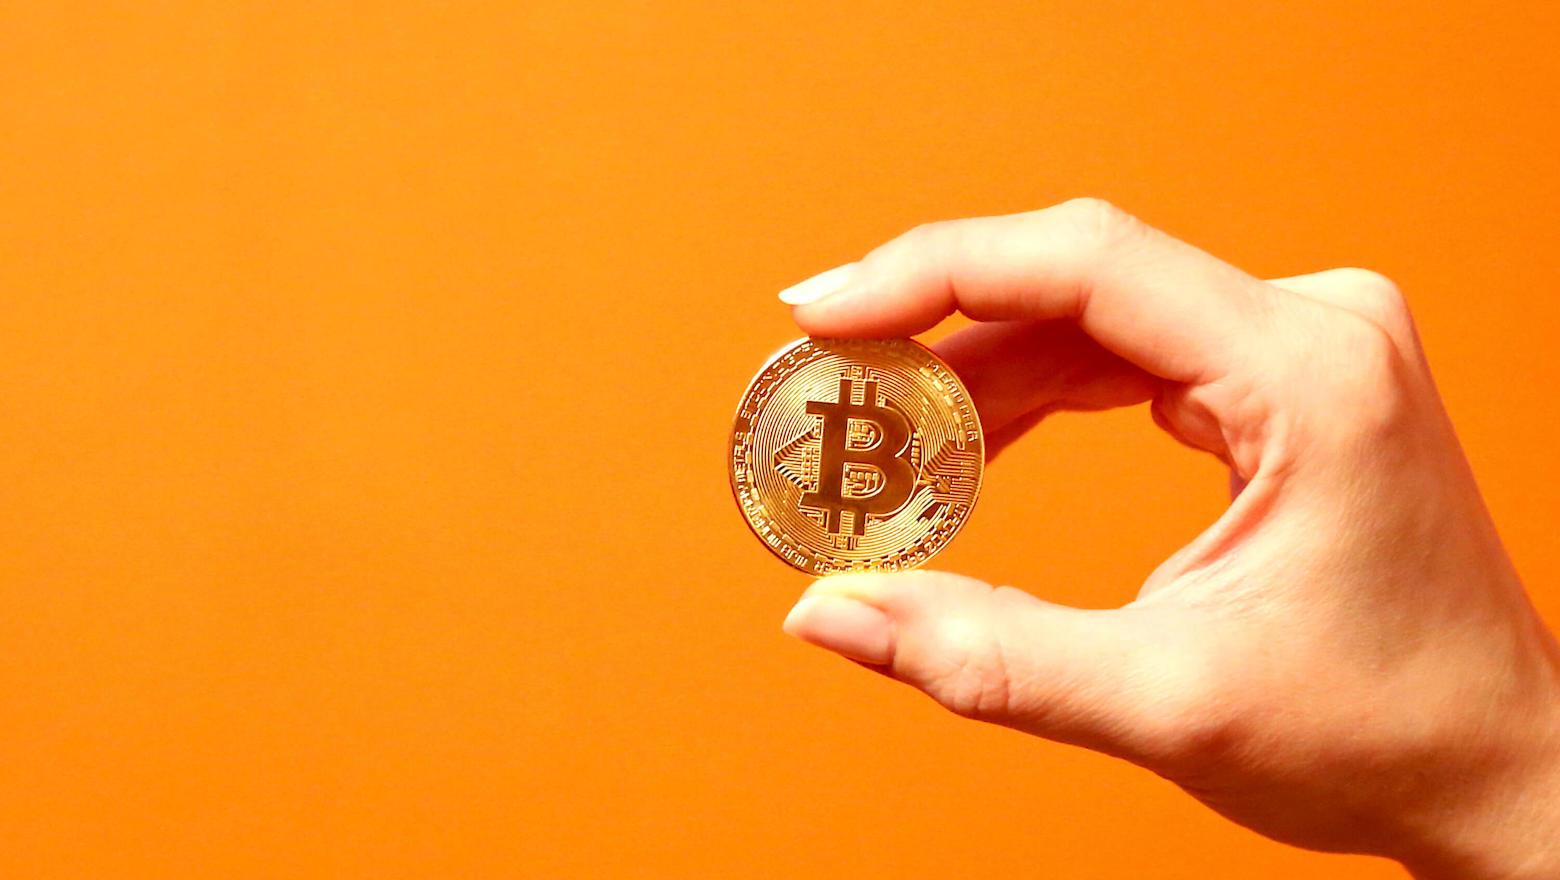 giorno trading crypto reddit)